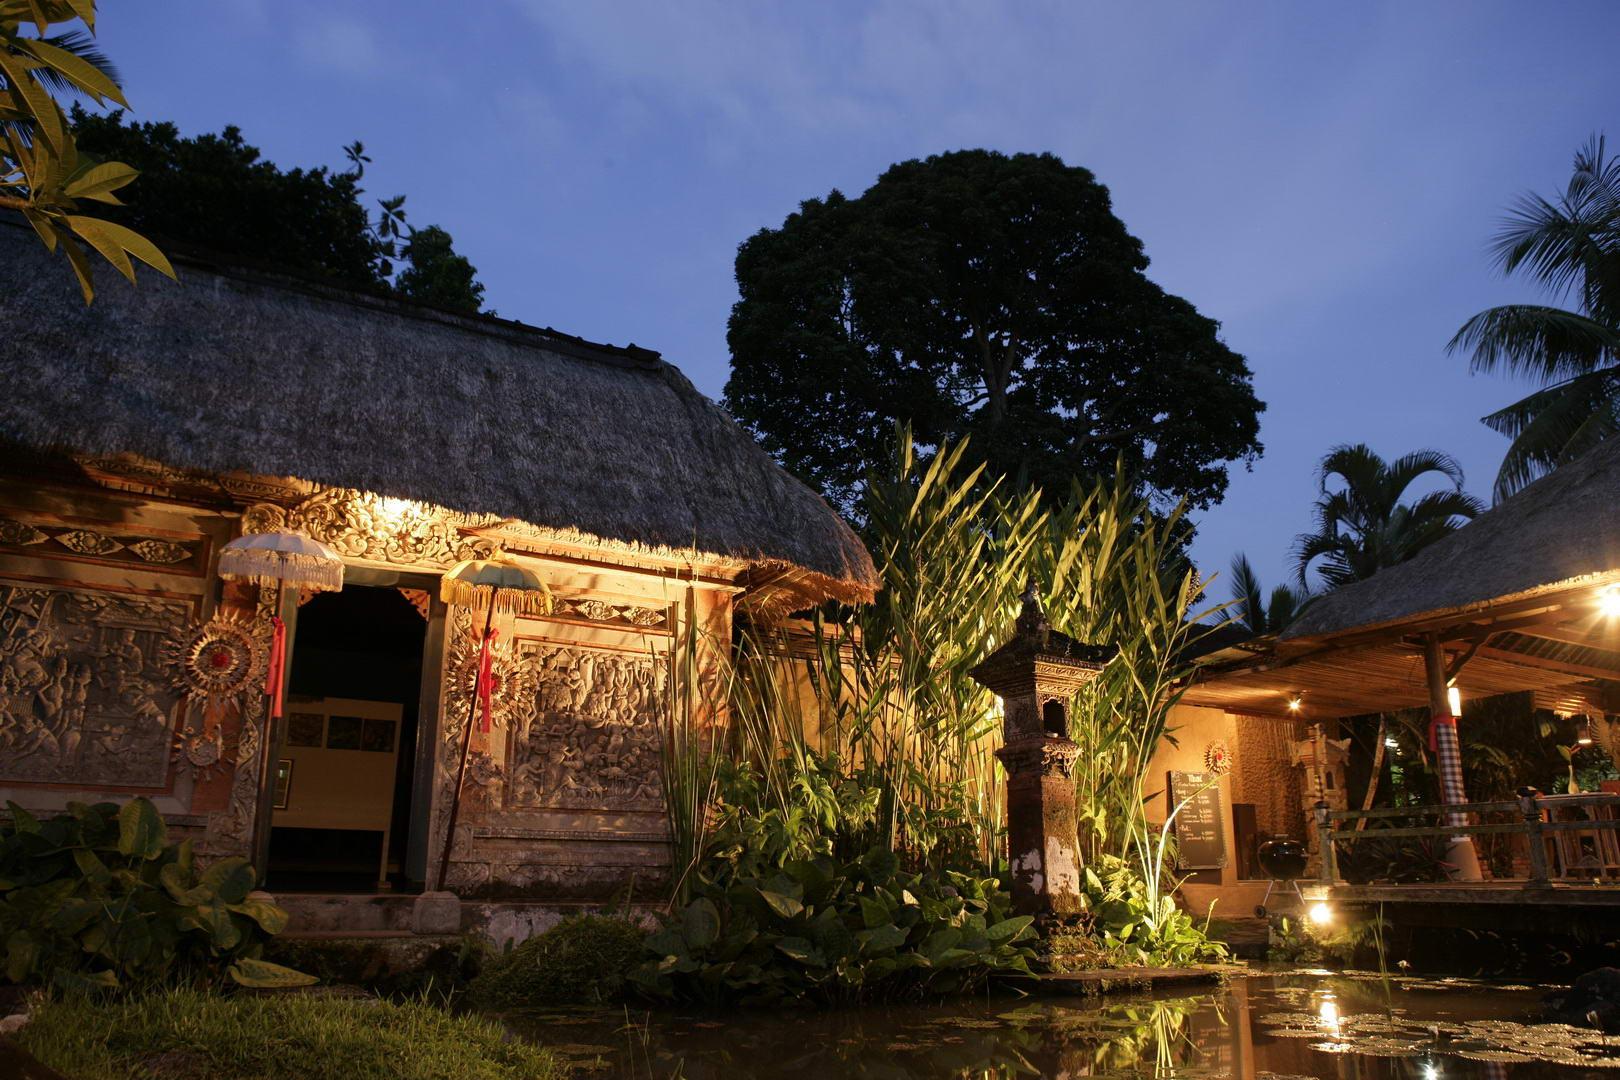 Eriks Bali 150